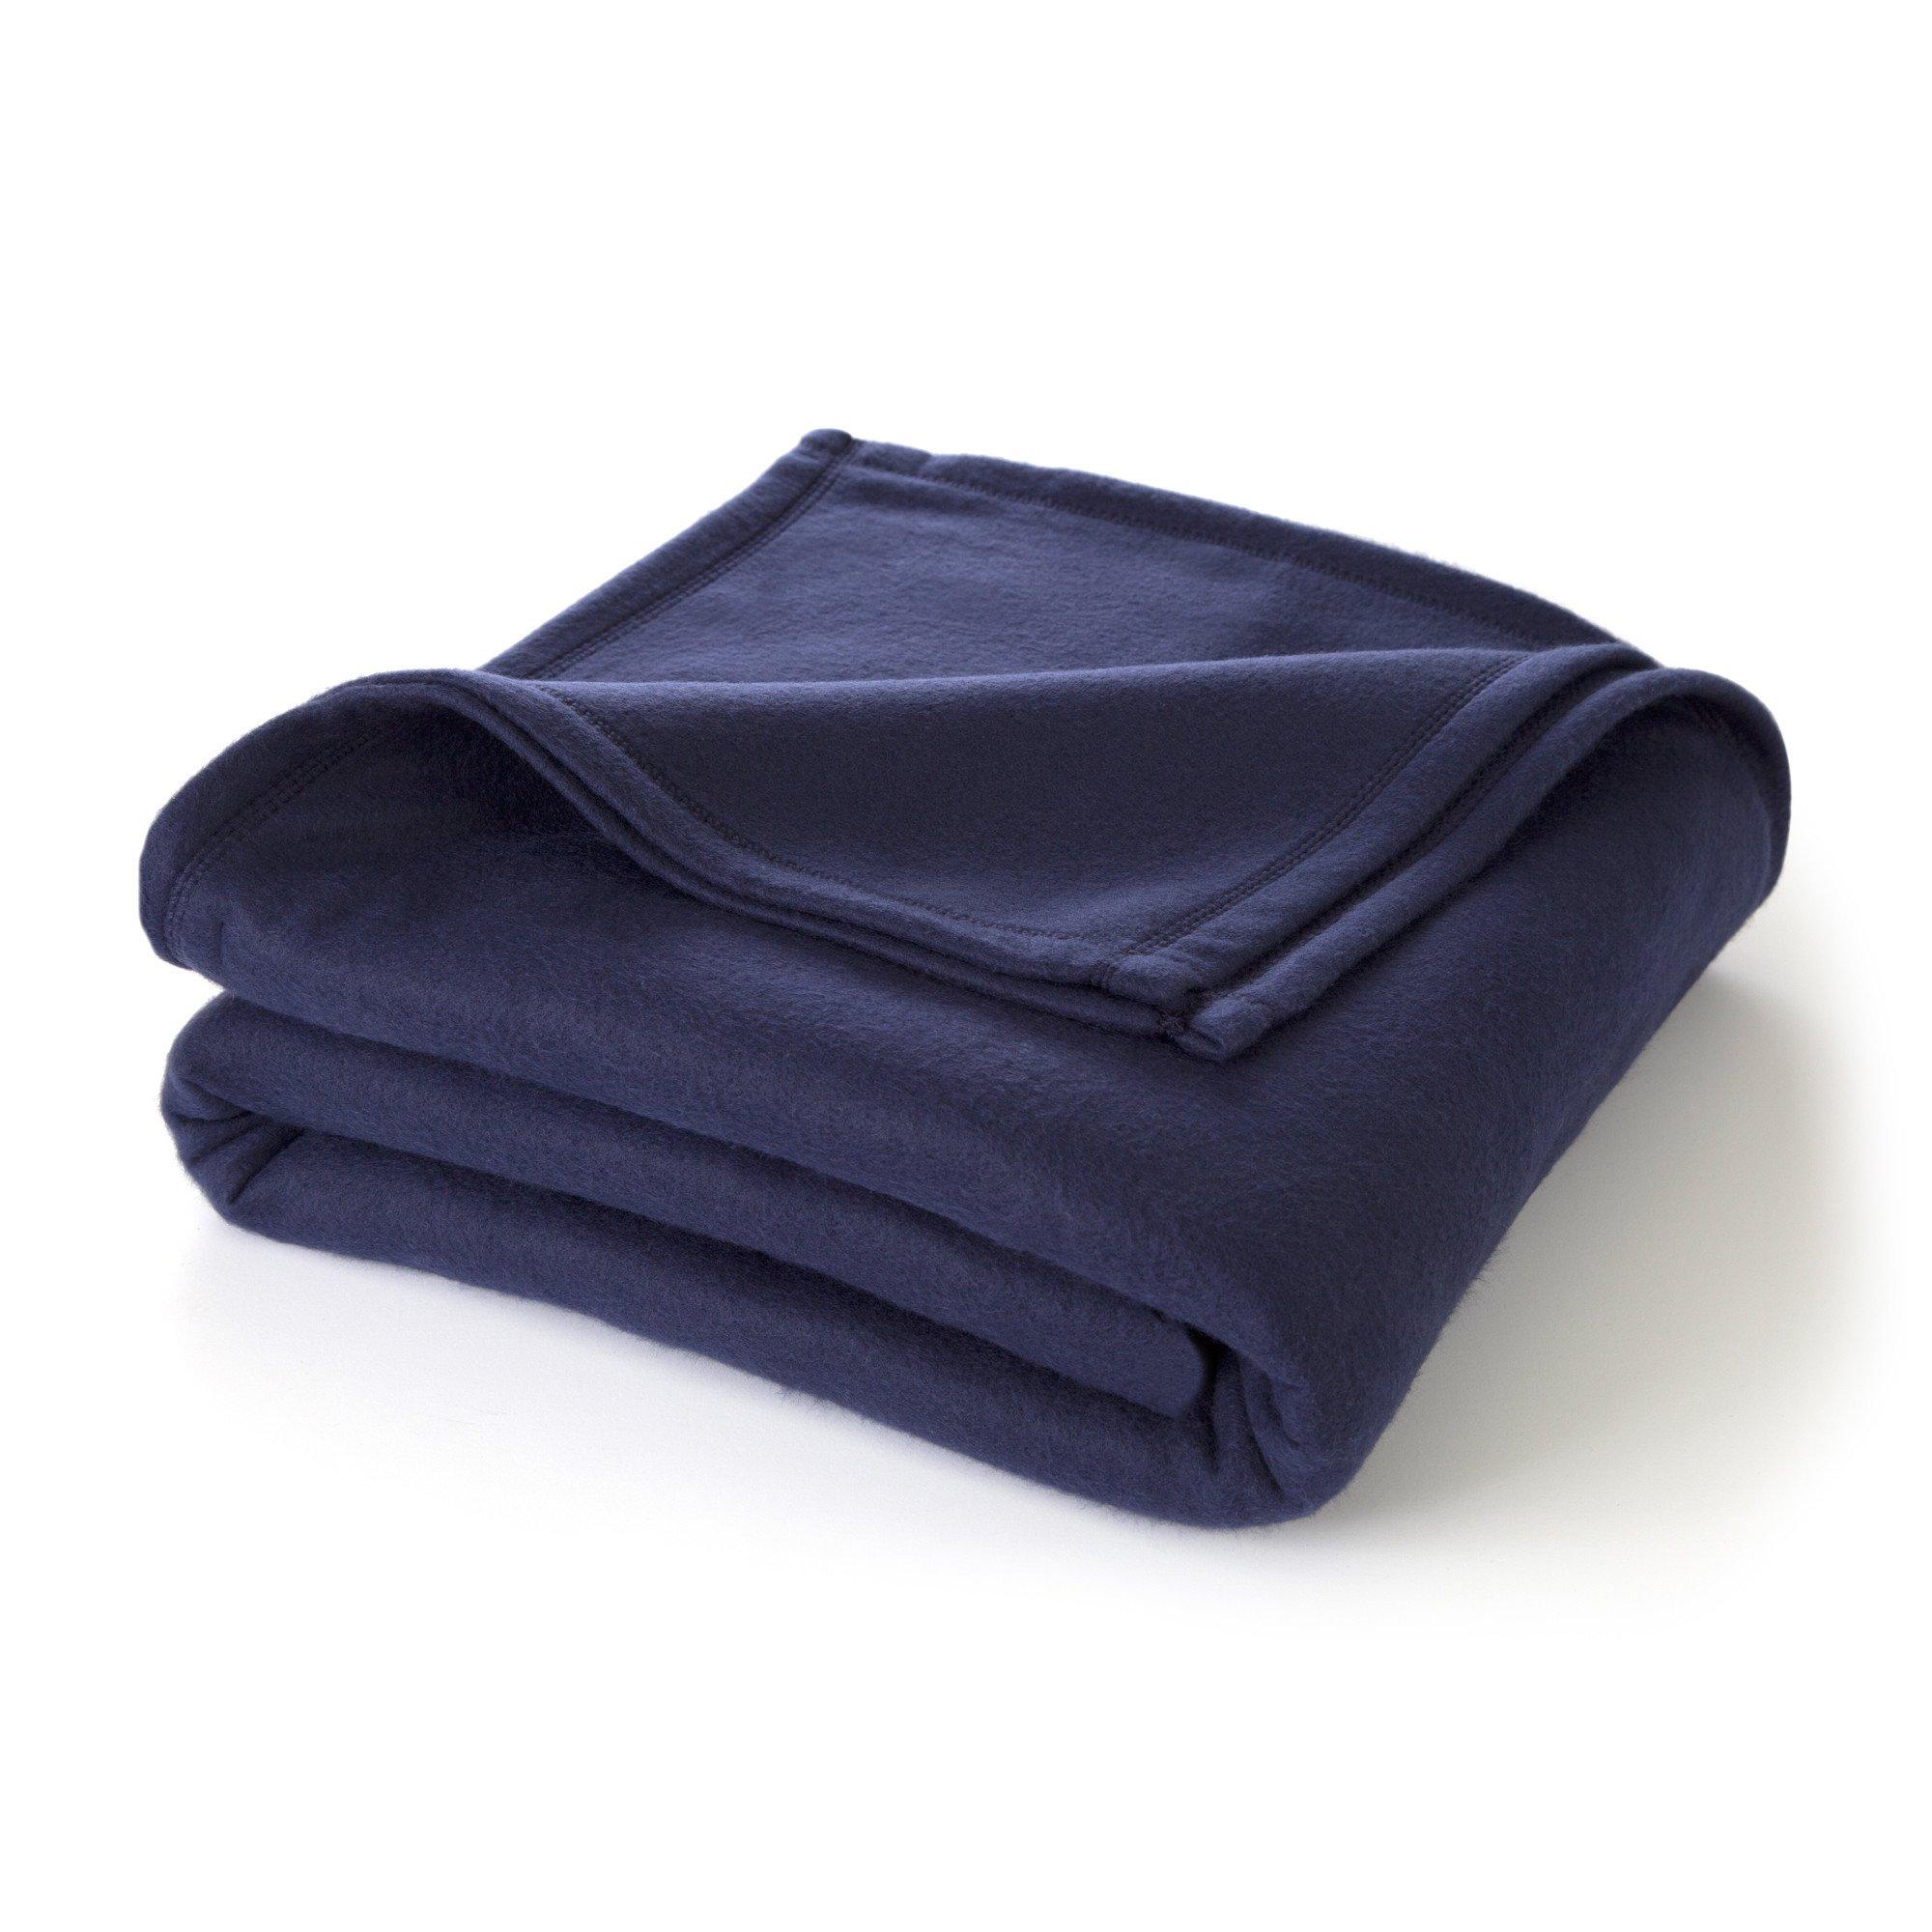 Martex Super Soft Fleece Blanket - Twin, Warm, Lightweight, Pet-Friendly, Throw for Home Bed, Sofa & Dorm - Navy